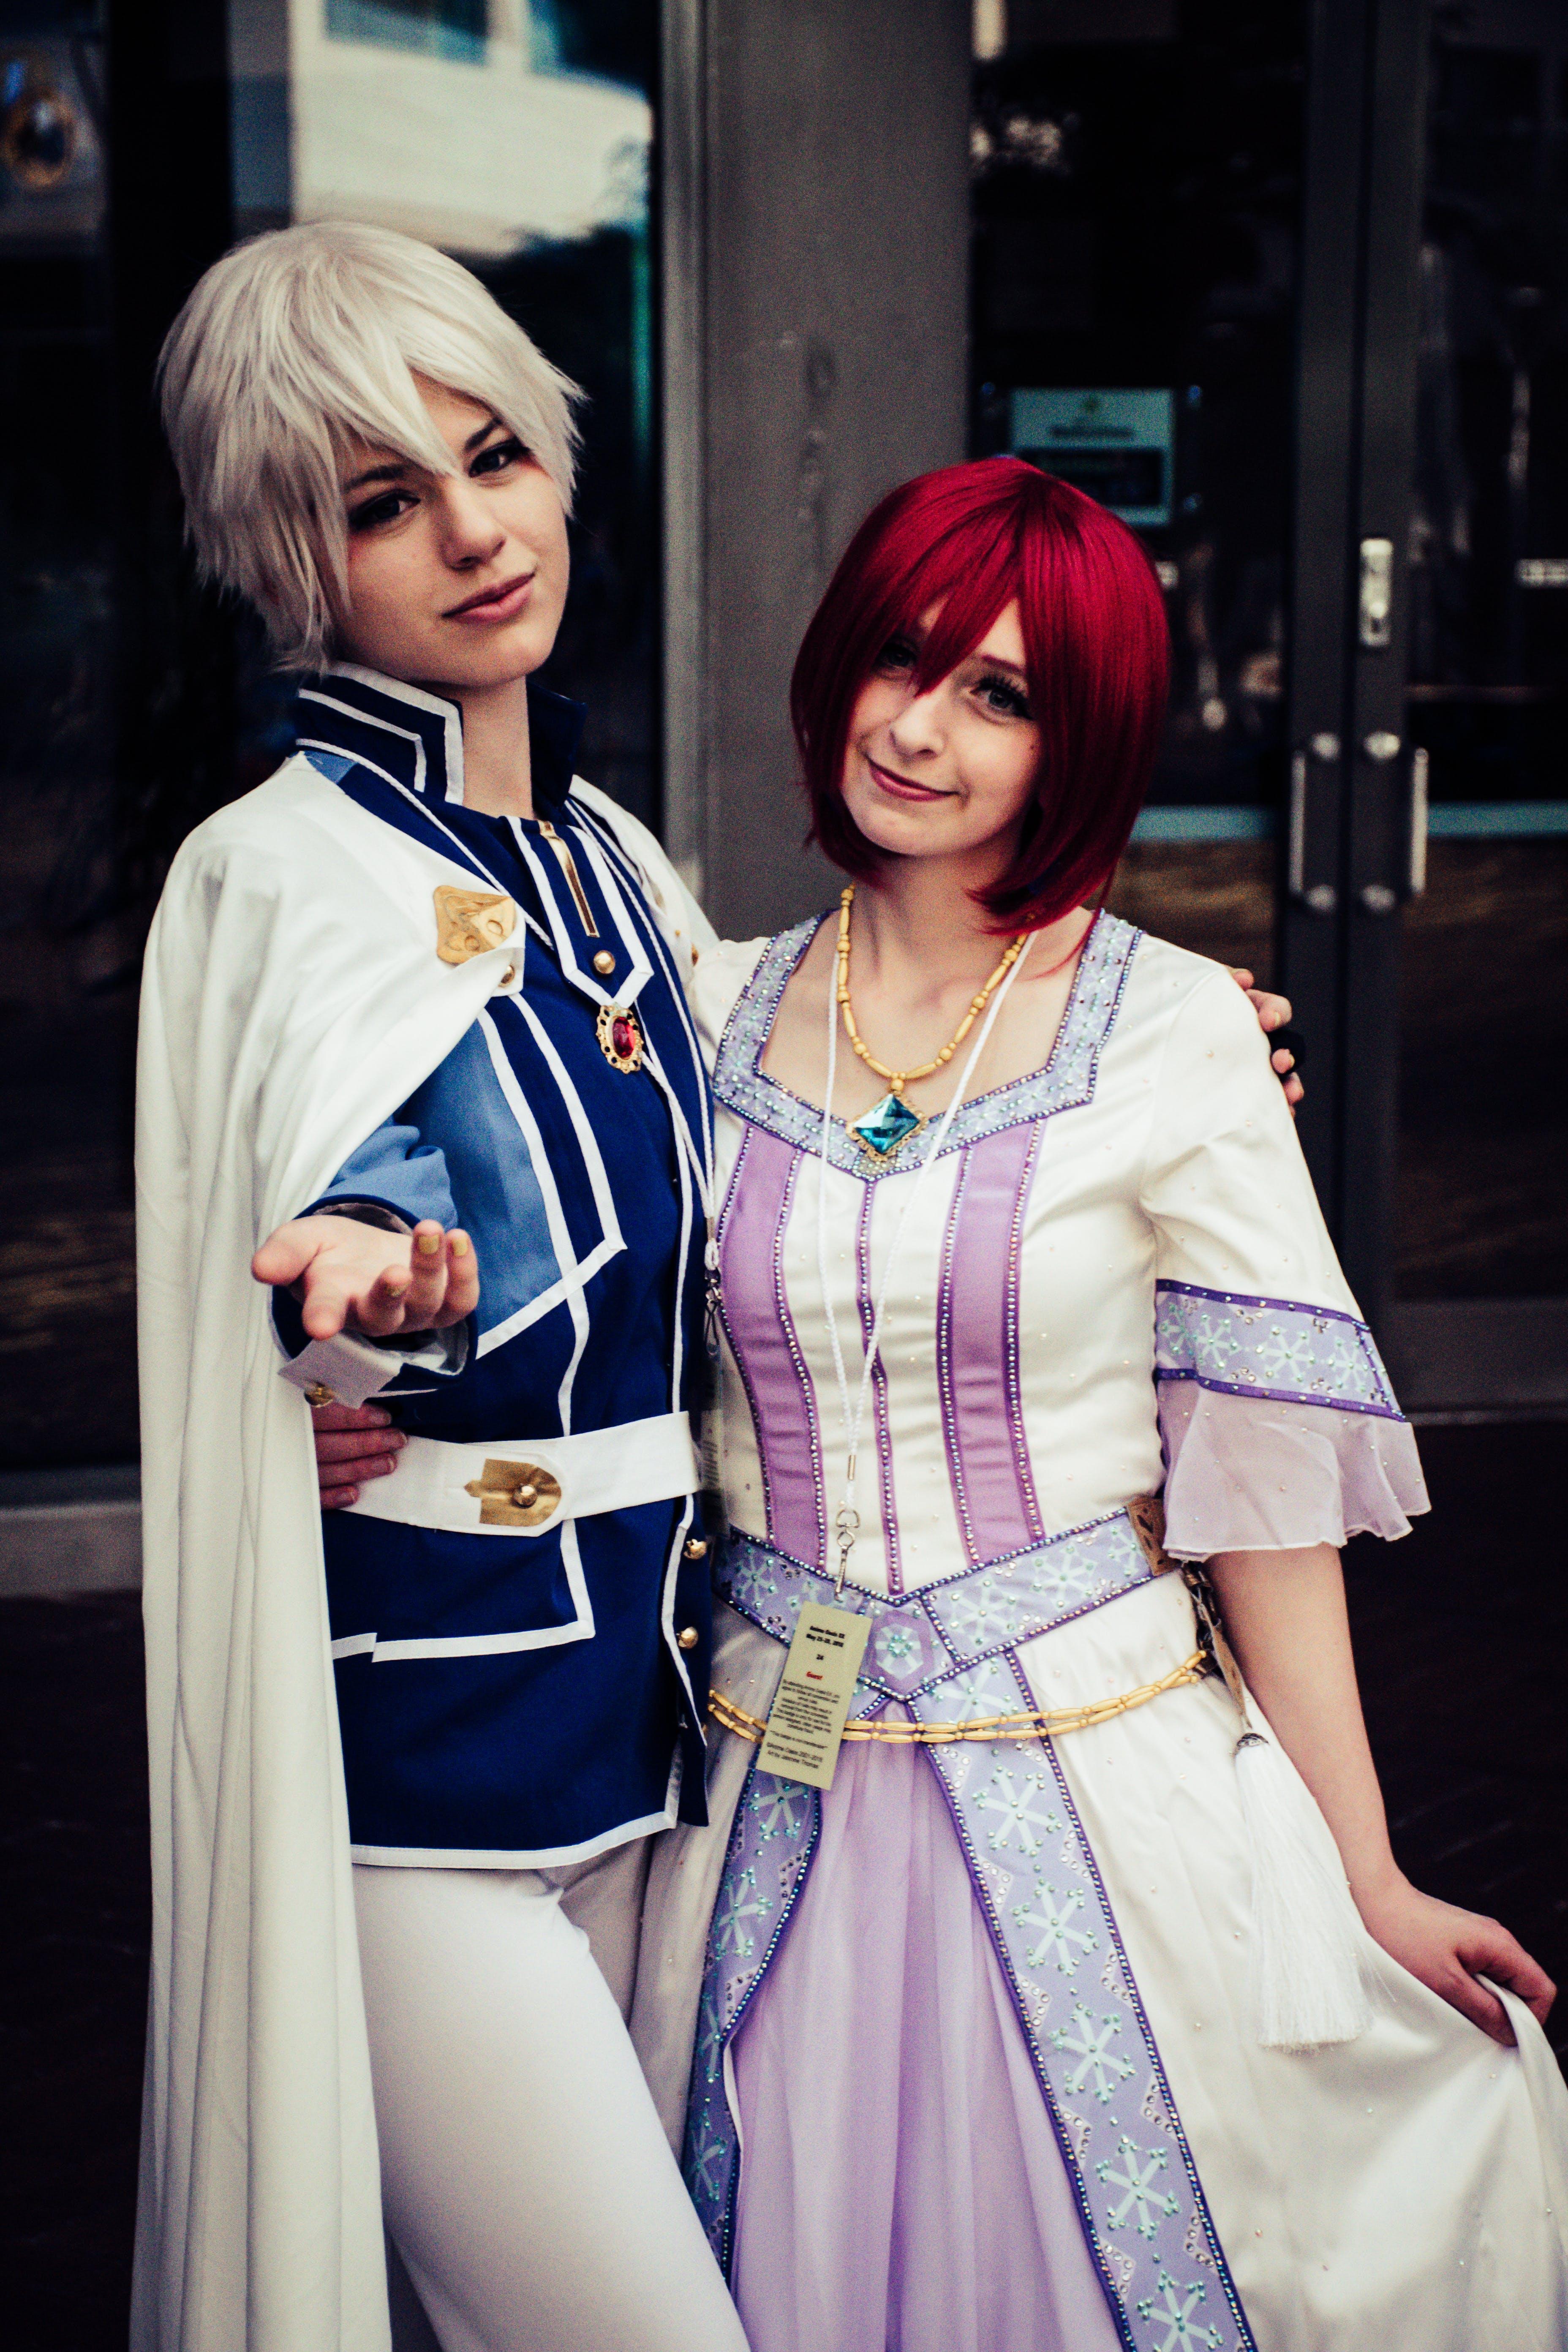 Two Women Wearing Anime Character Cosplay